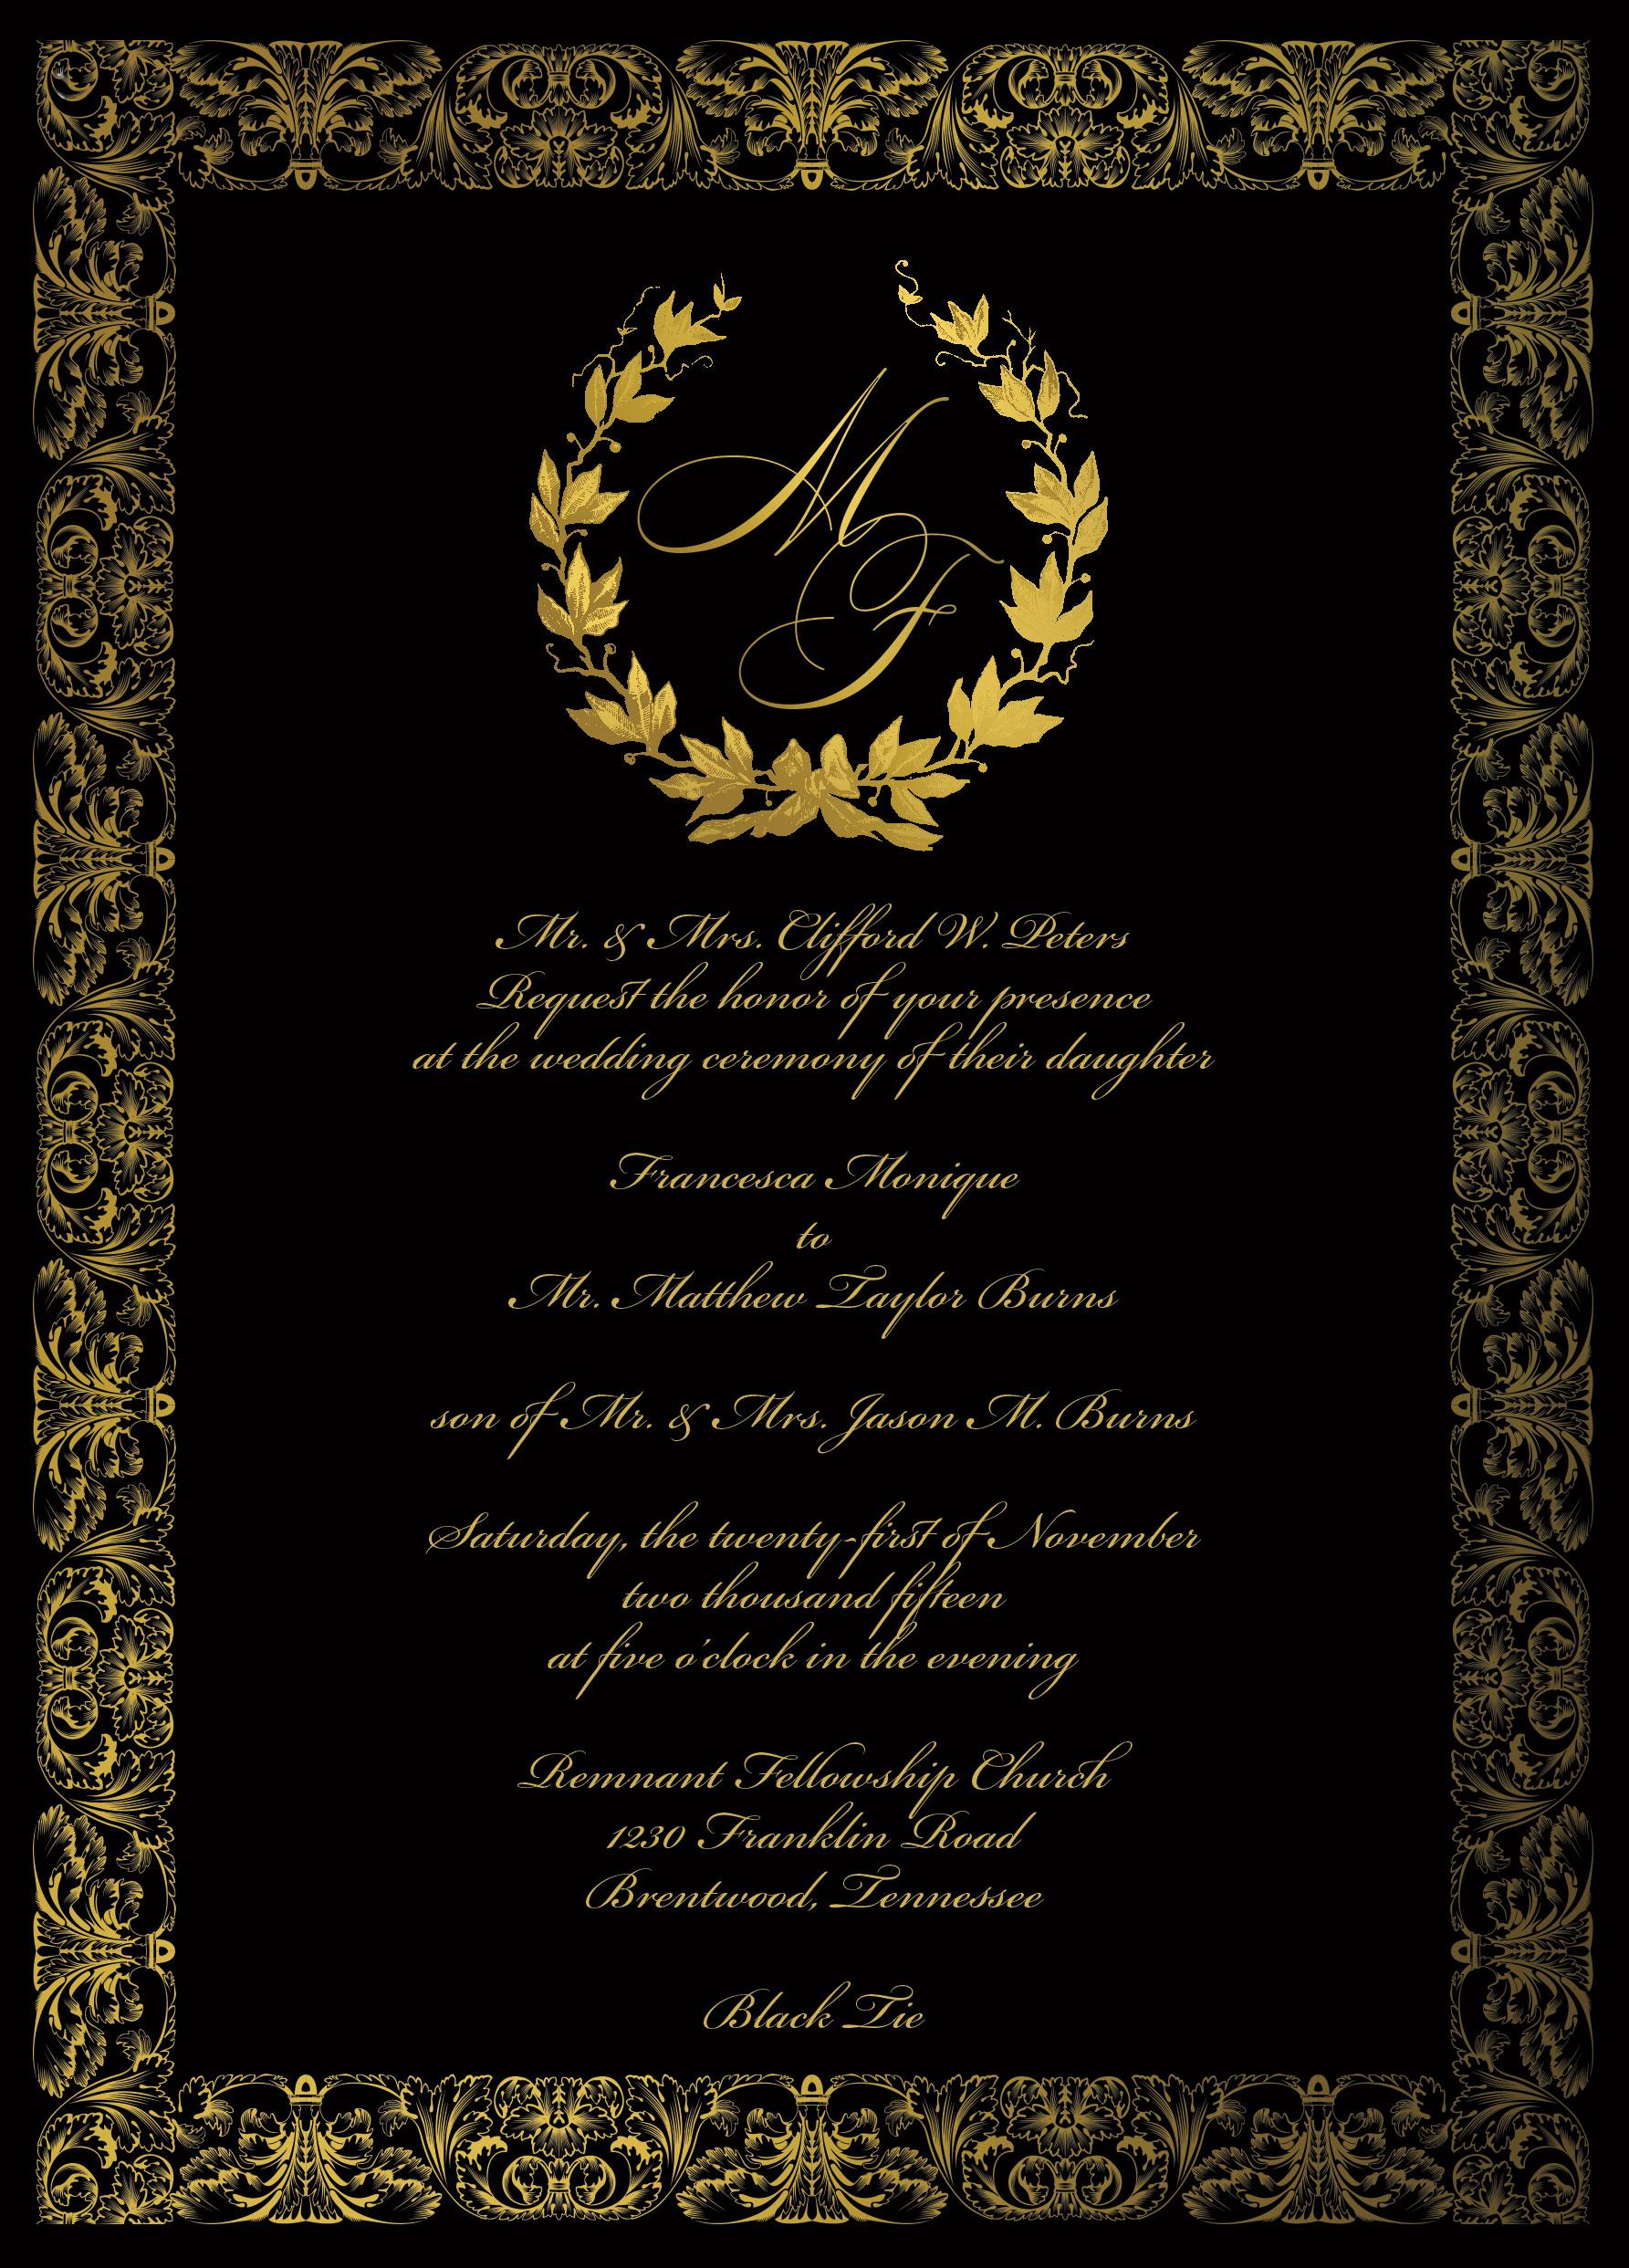 invitation images background